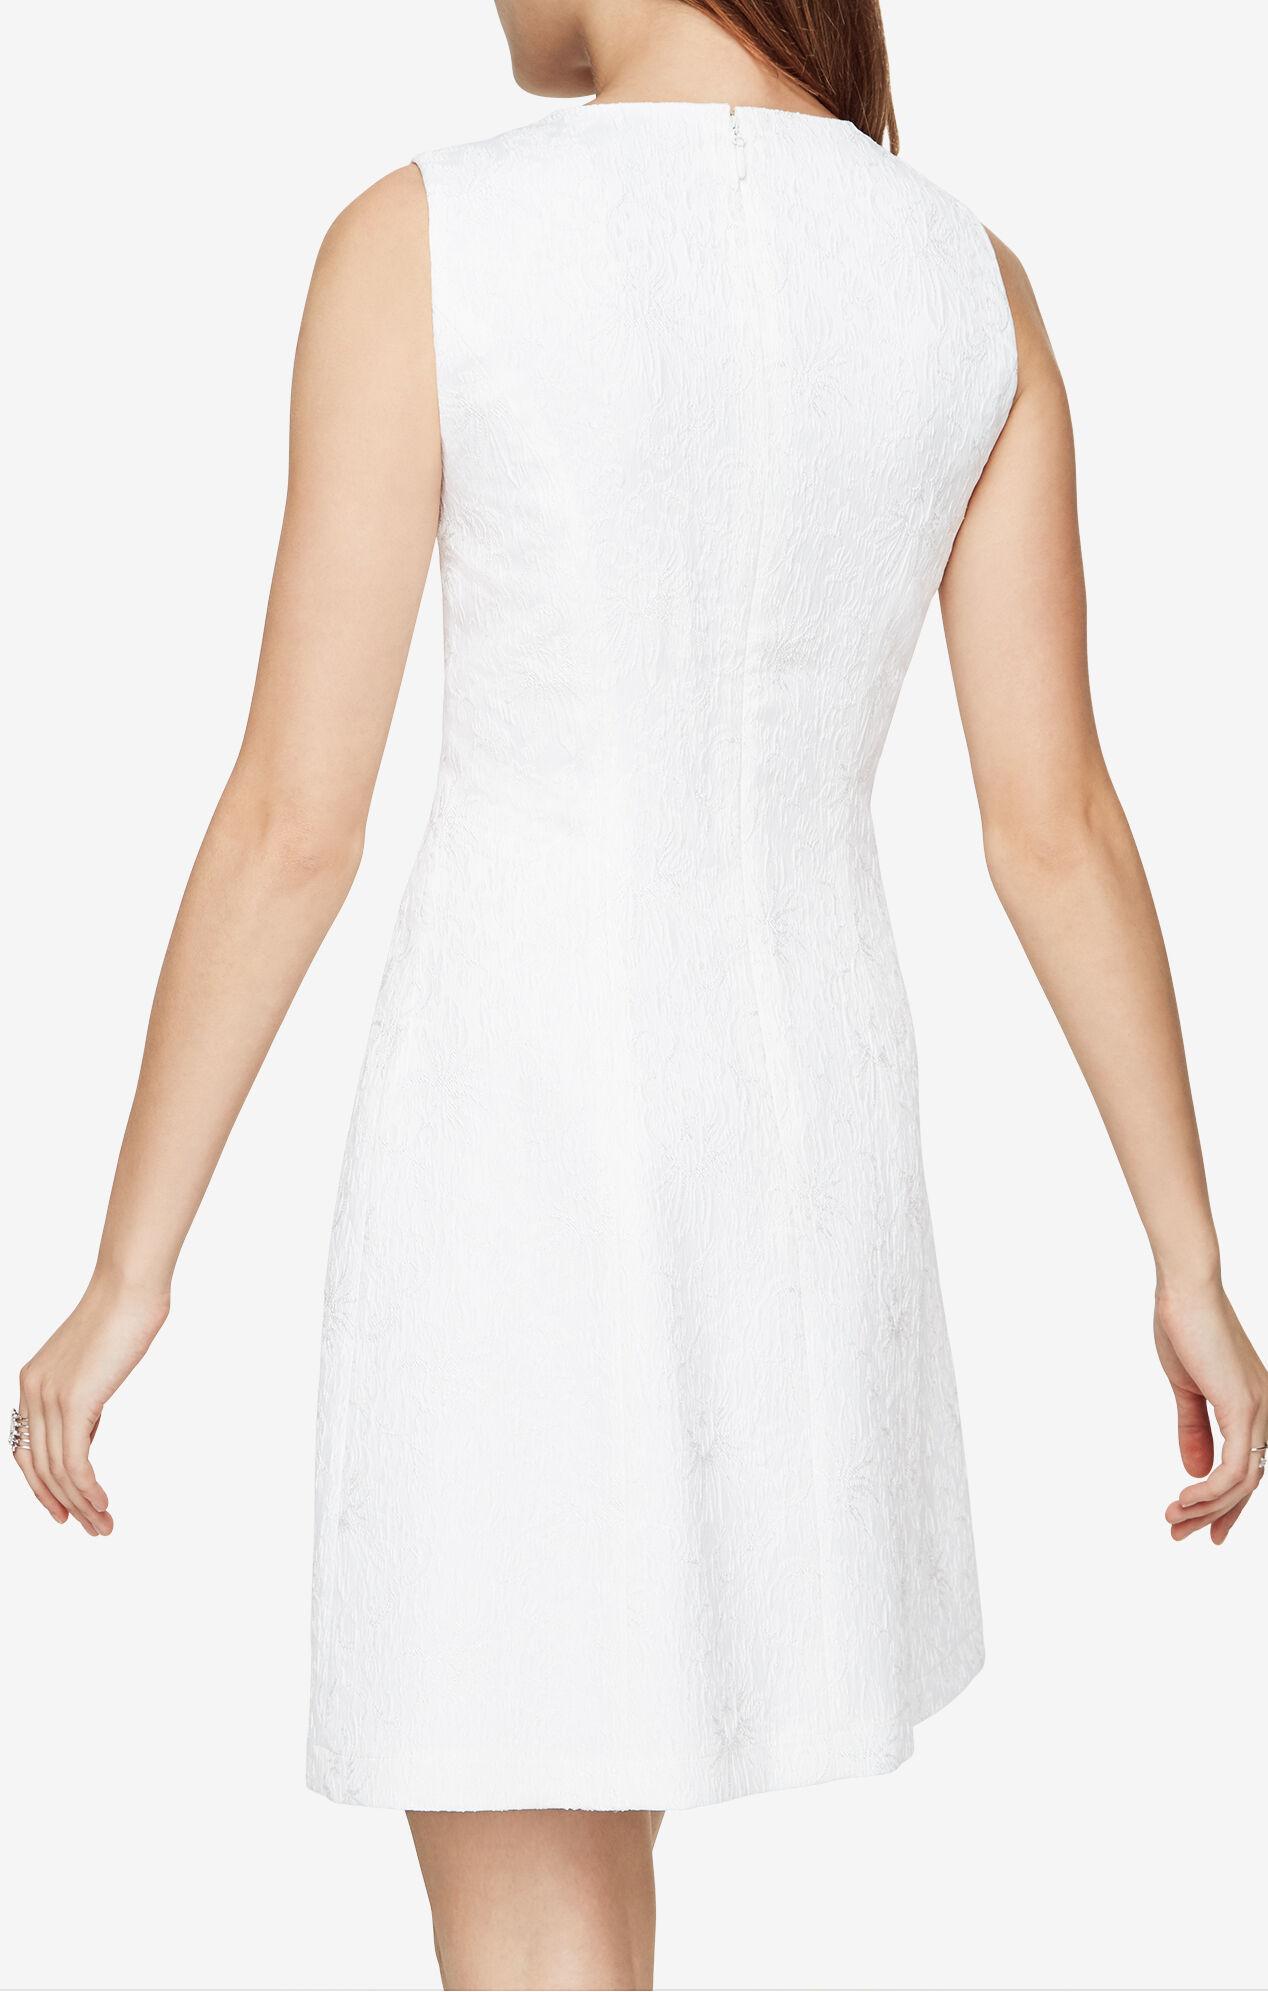 Hannelli Floral Jacquard Dress